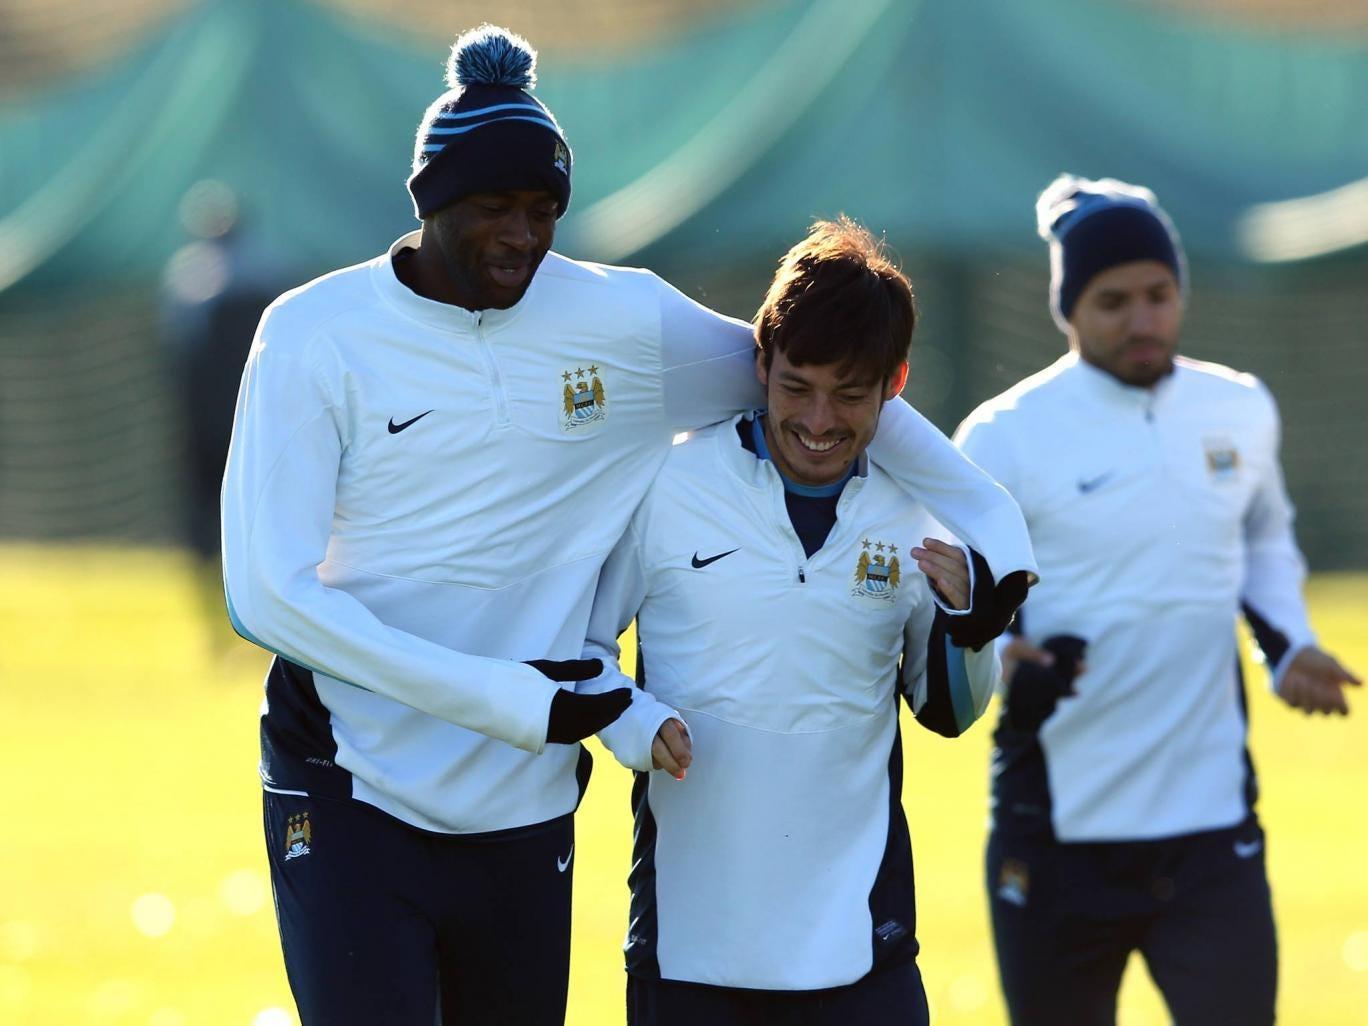 David Silva with Yaya Toure in training